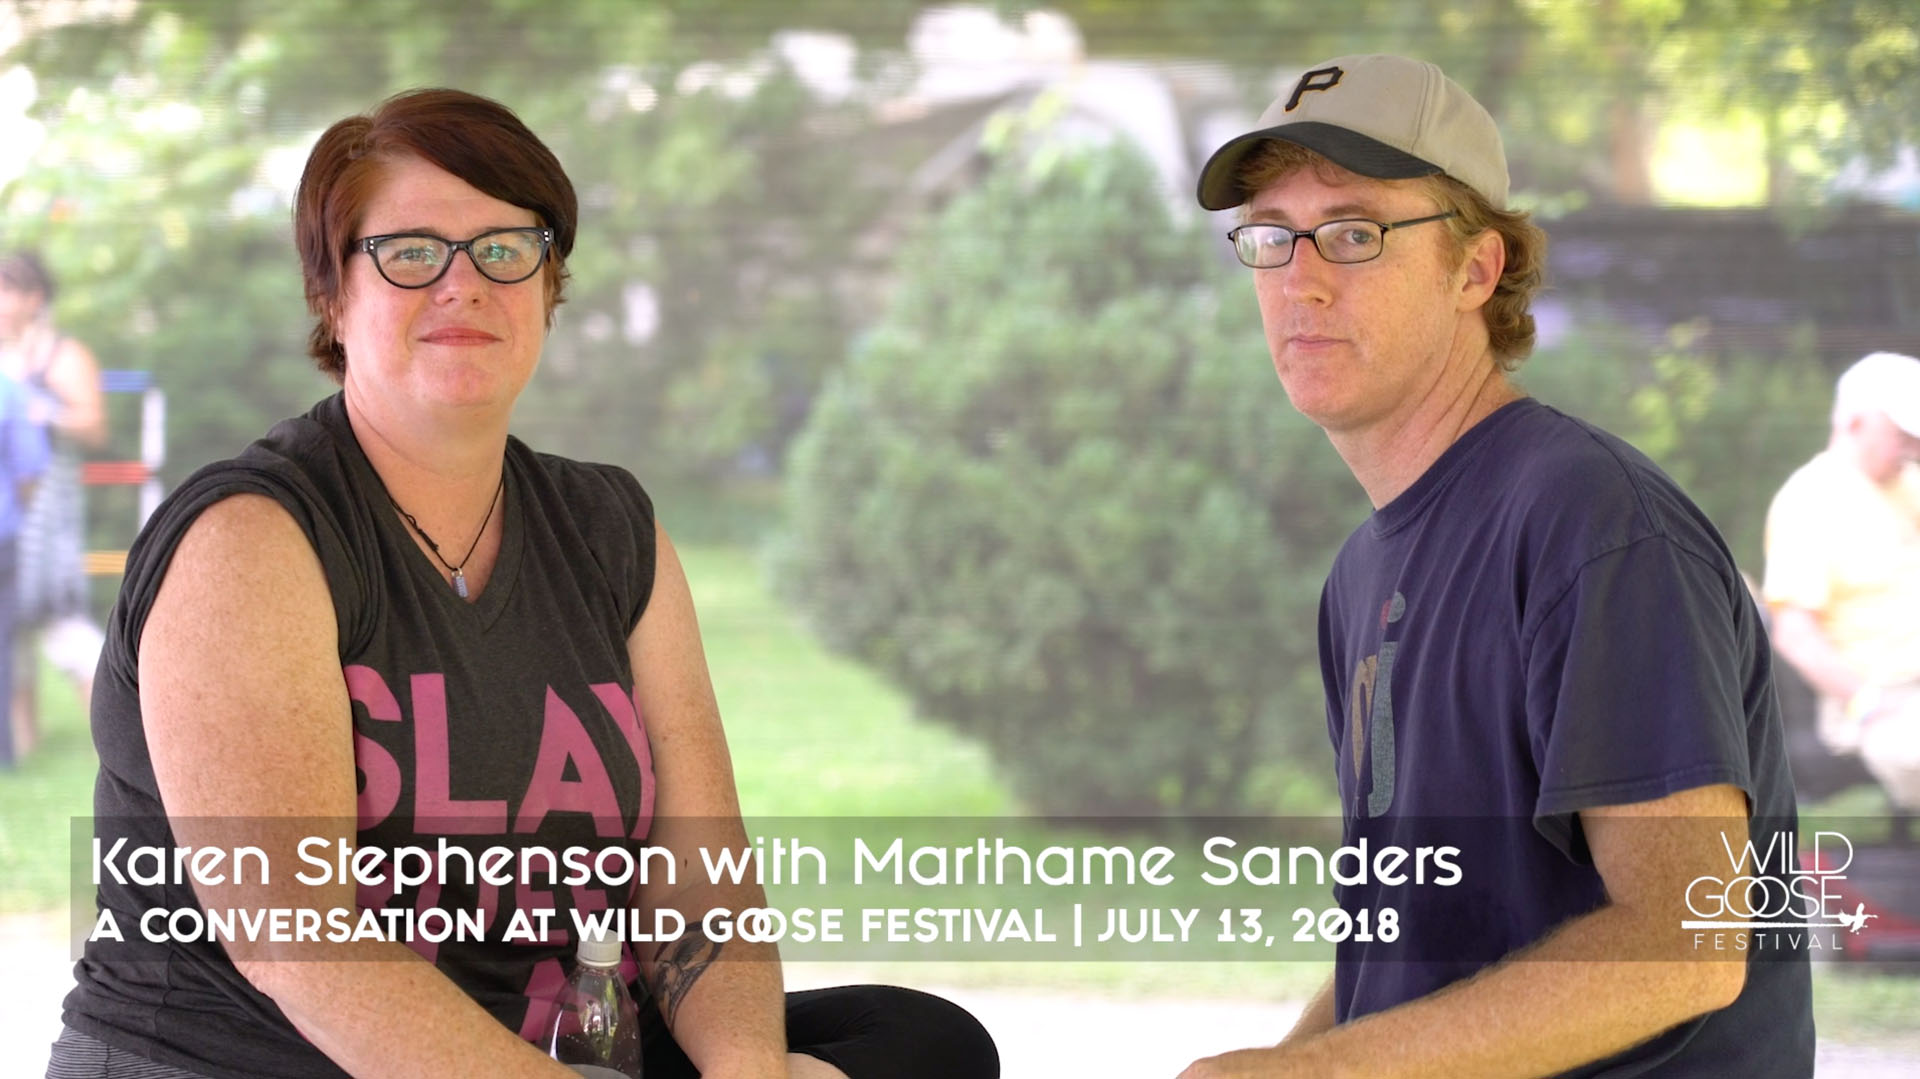 Karen Stephenson with Marthame Sanders - Atlanta Bar Church